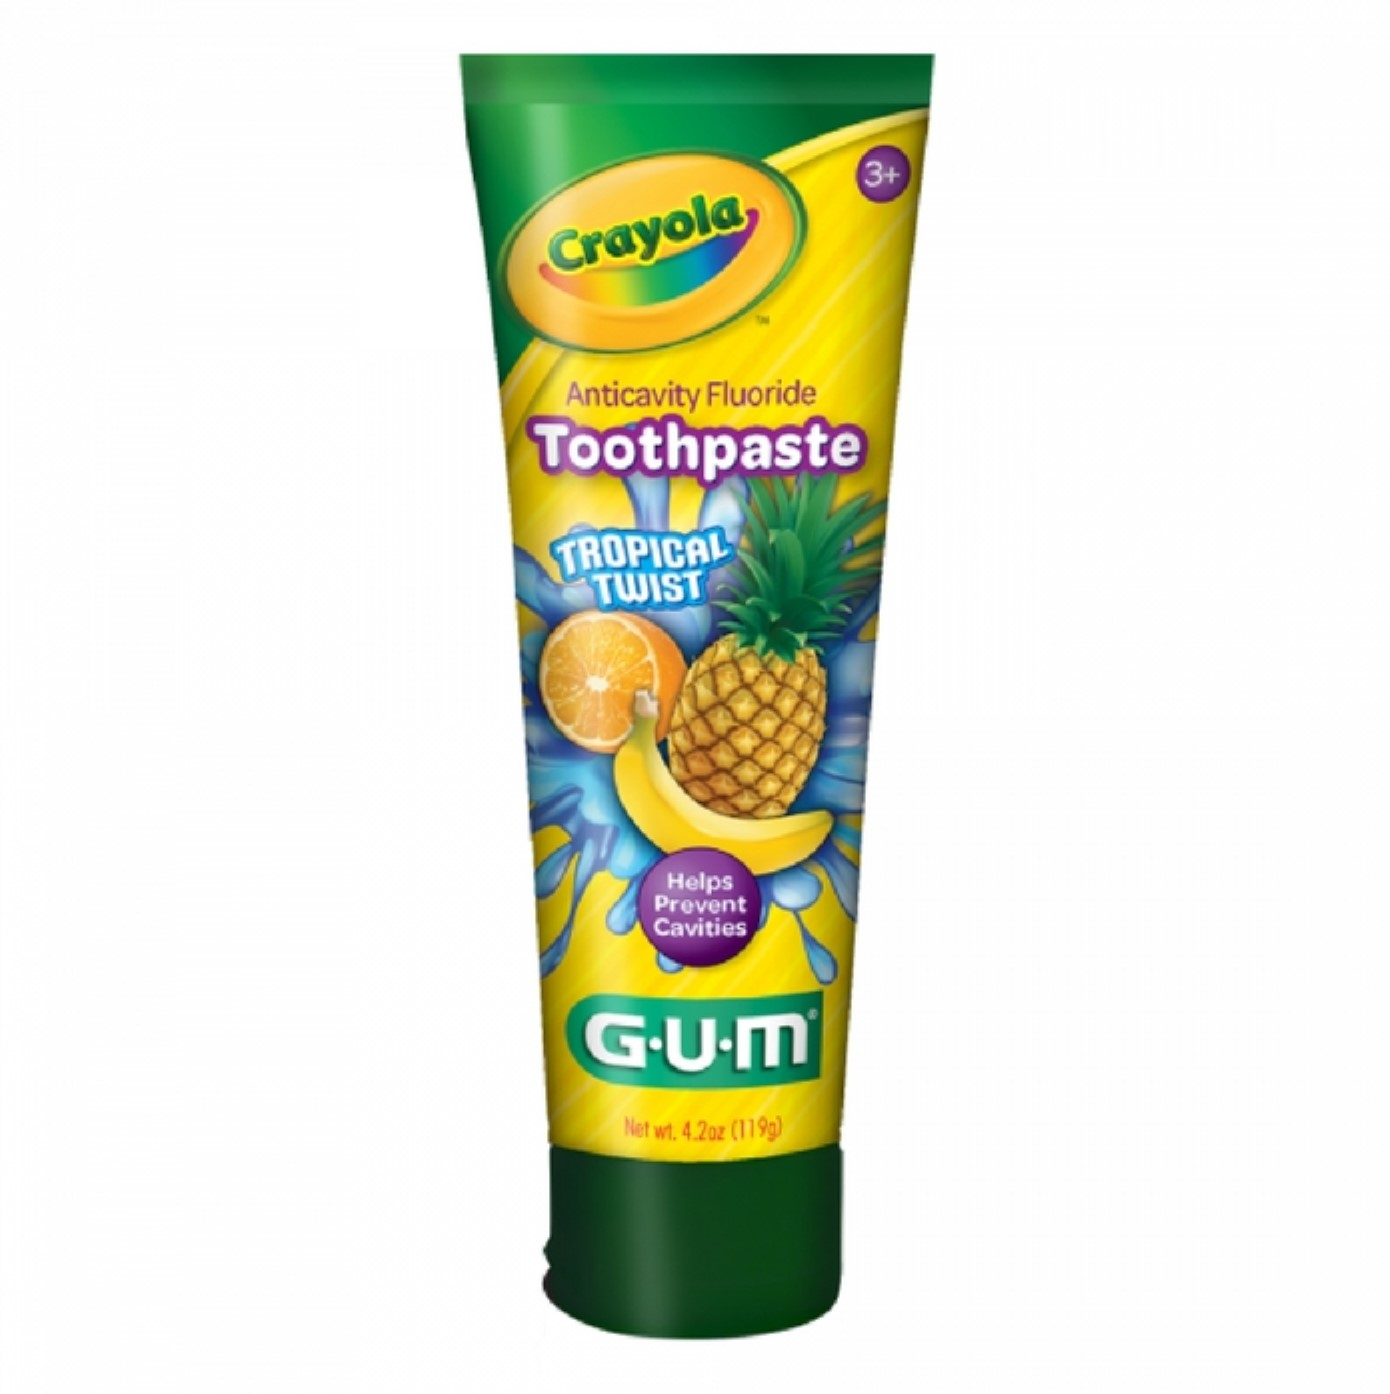 6 Pack - GUM Crayola Anticavity Flouride Toothpaste, Tropical Twist 4.2 oz